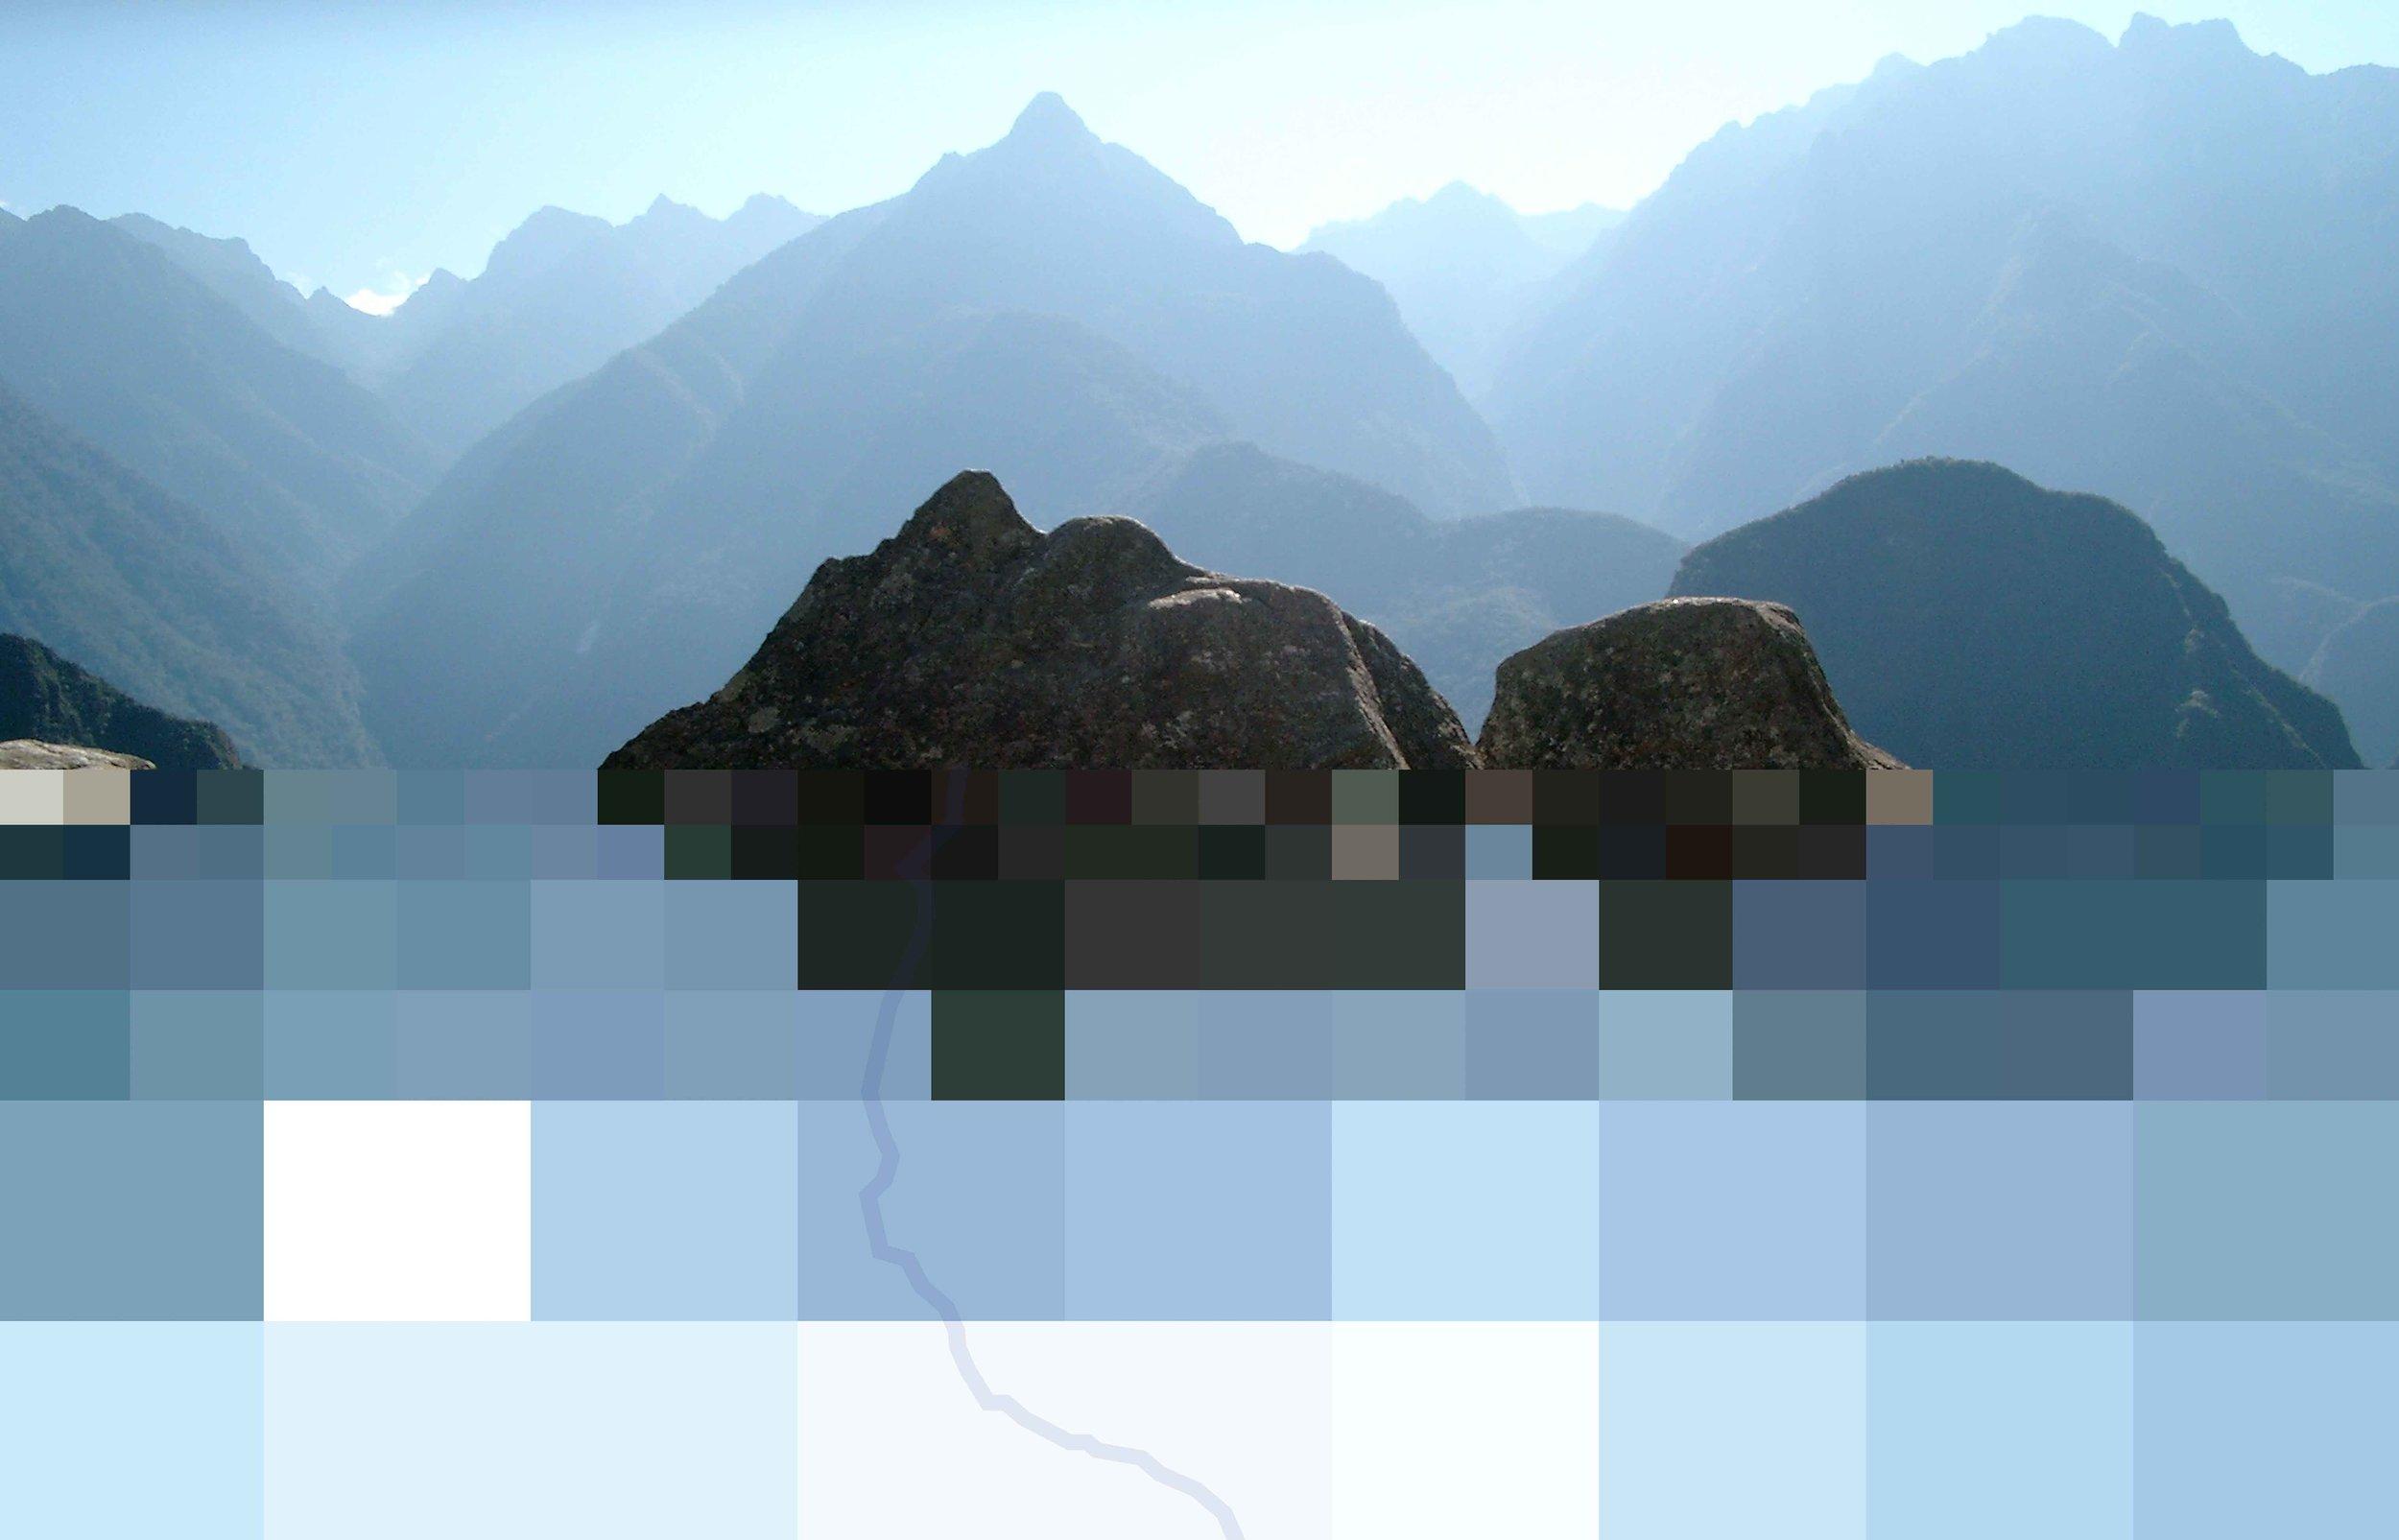 Brian_Thompson_To See Machu Pichu, 2018, Giclée Print.jpg